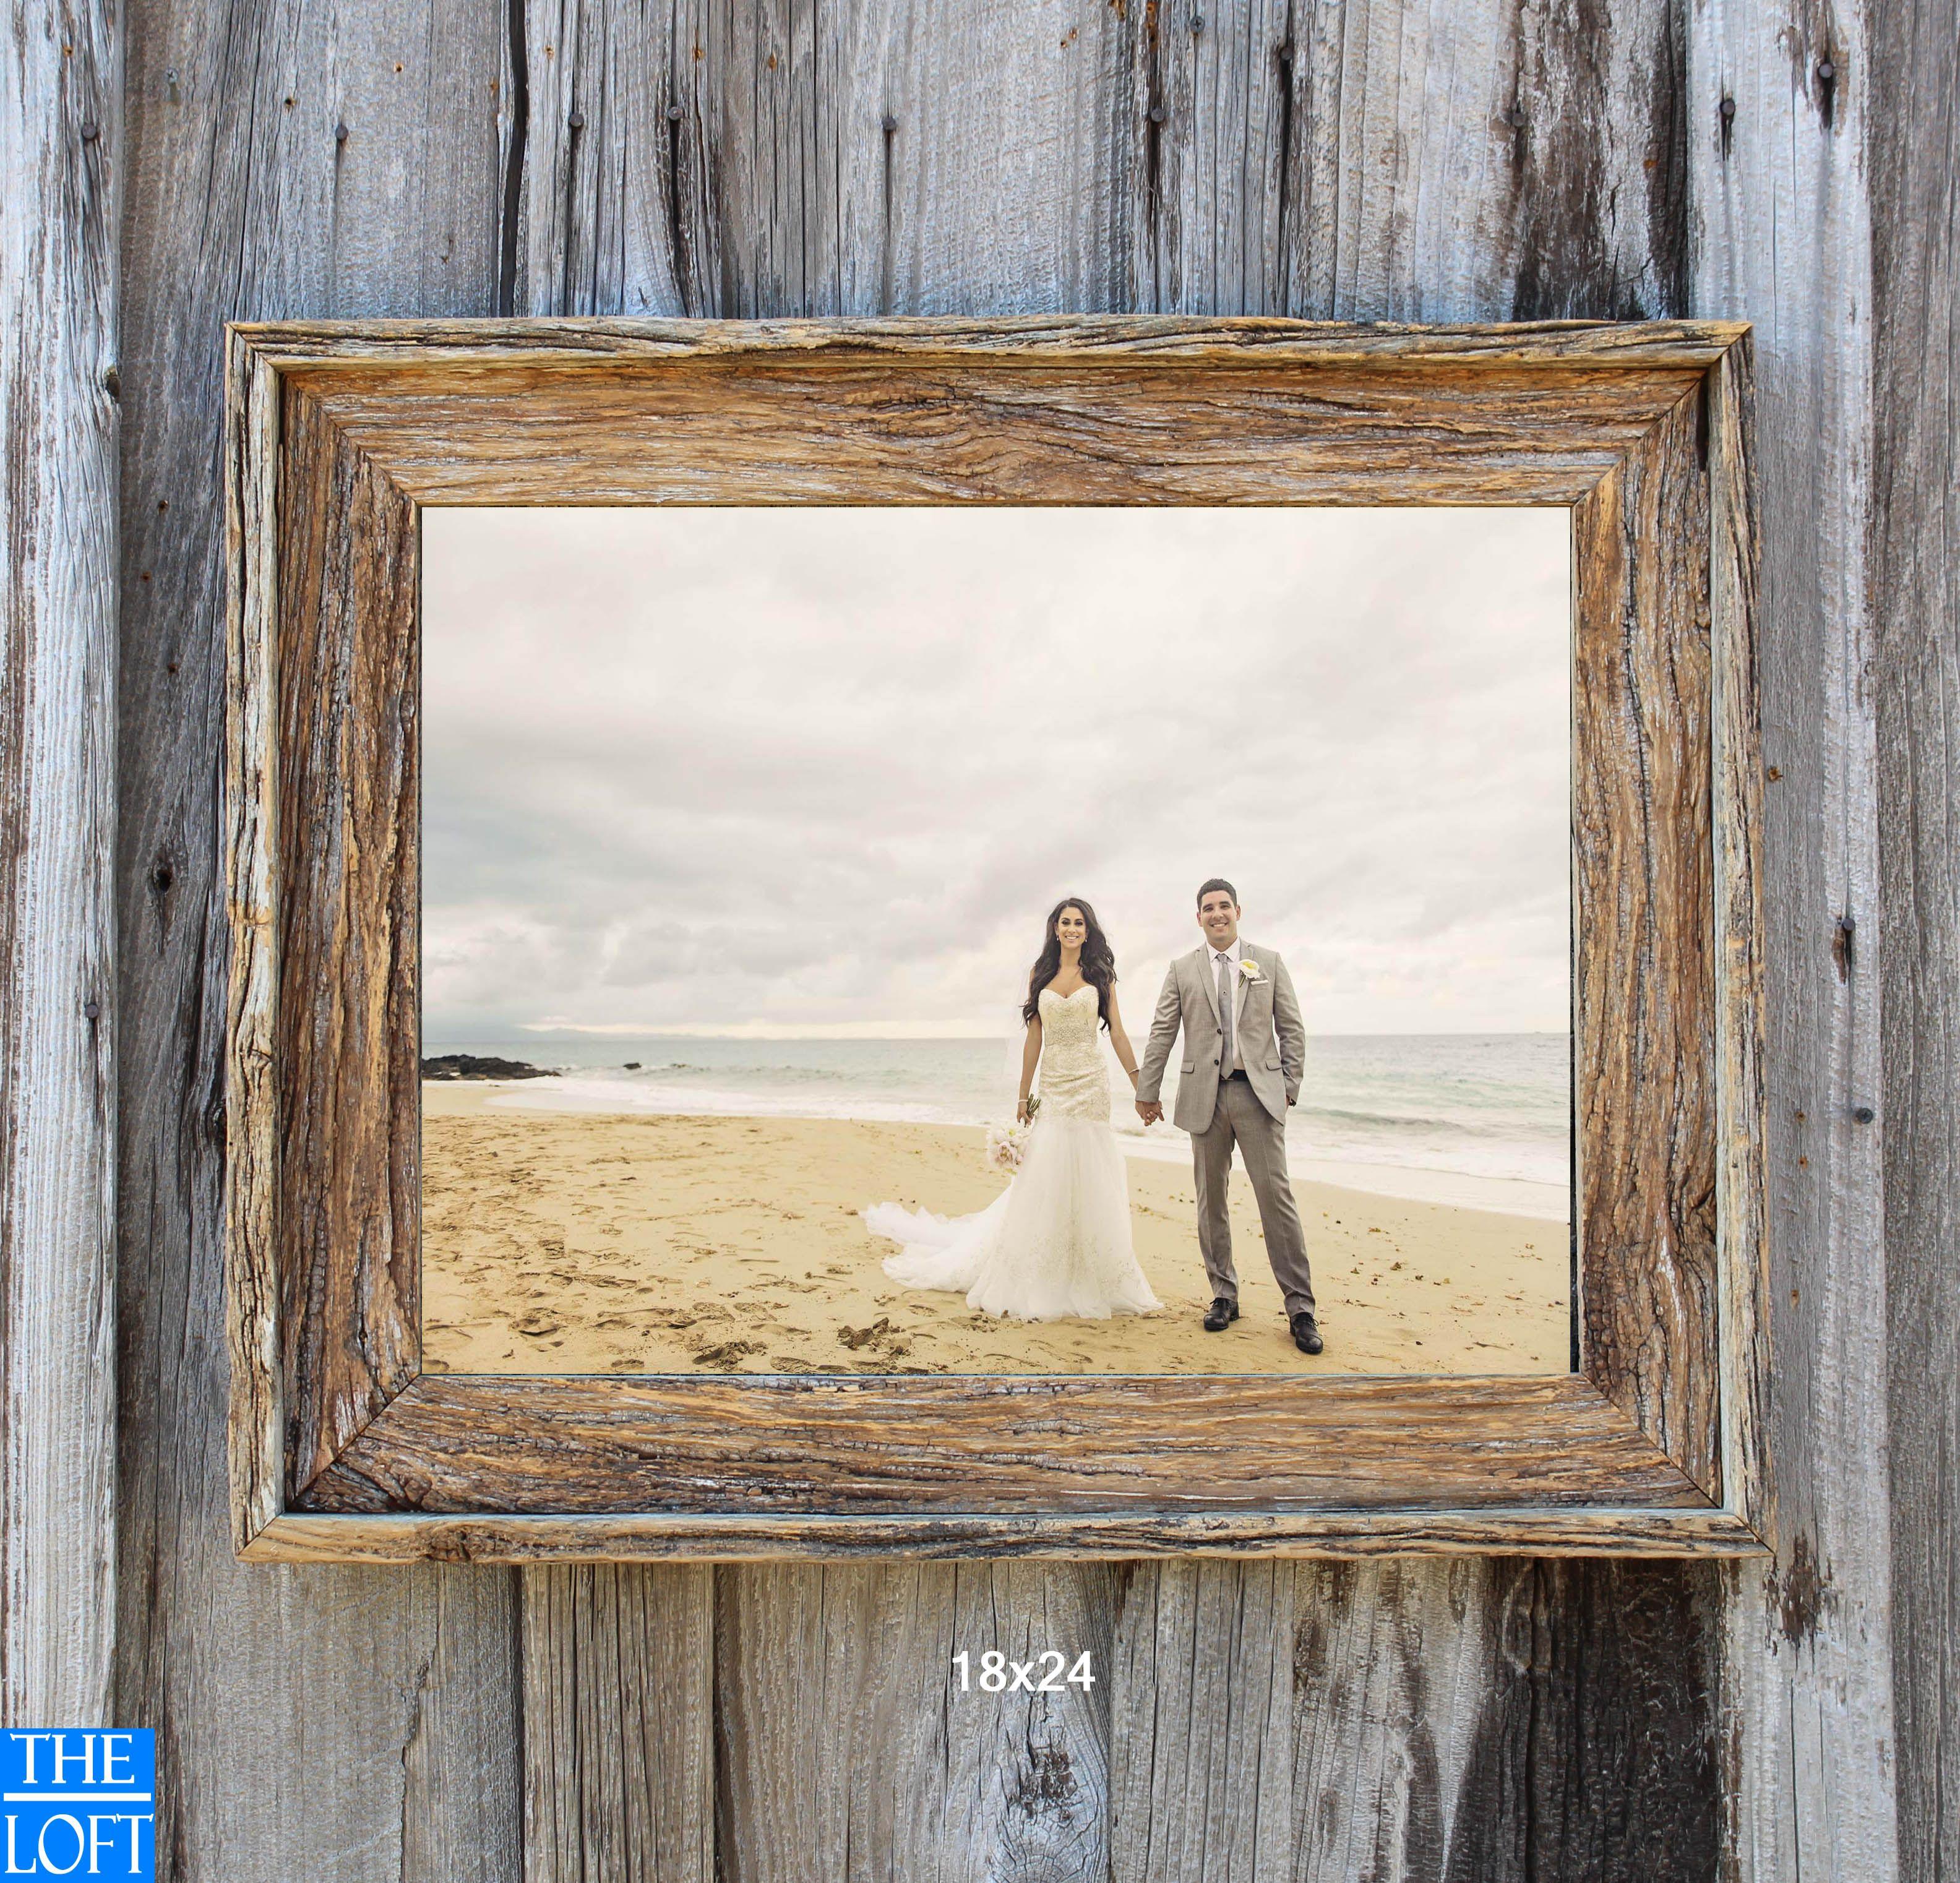 Natural 18x24 frame for customer | Rustic Barn Wood Frames ...